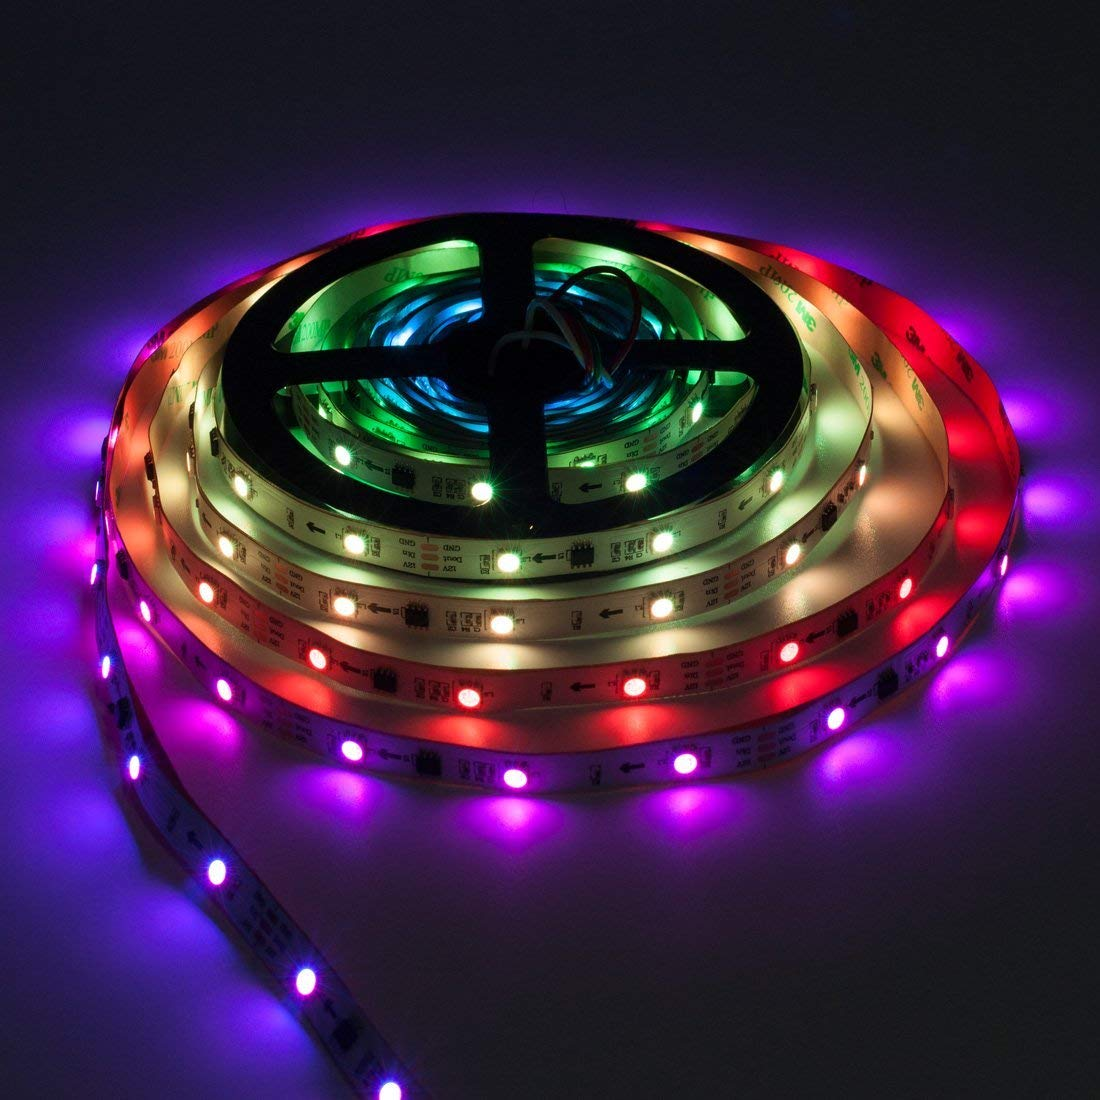 Lighting-Source WS2811 5m 16.4ft 30LEDs/m 150LEDs Addressable Flexible LED Strip Dream Color IP30 Non-Waterproof DC12V